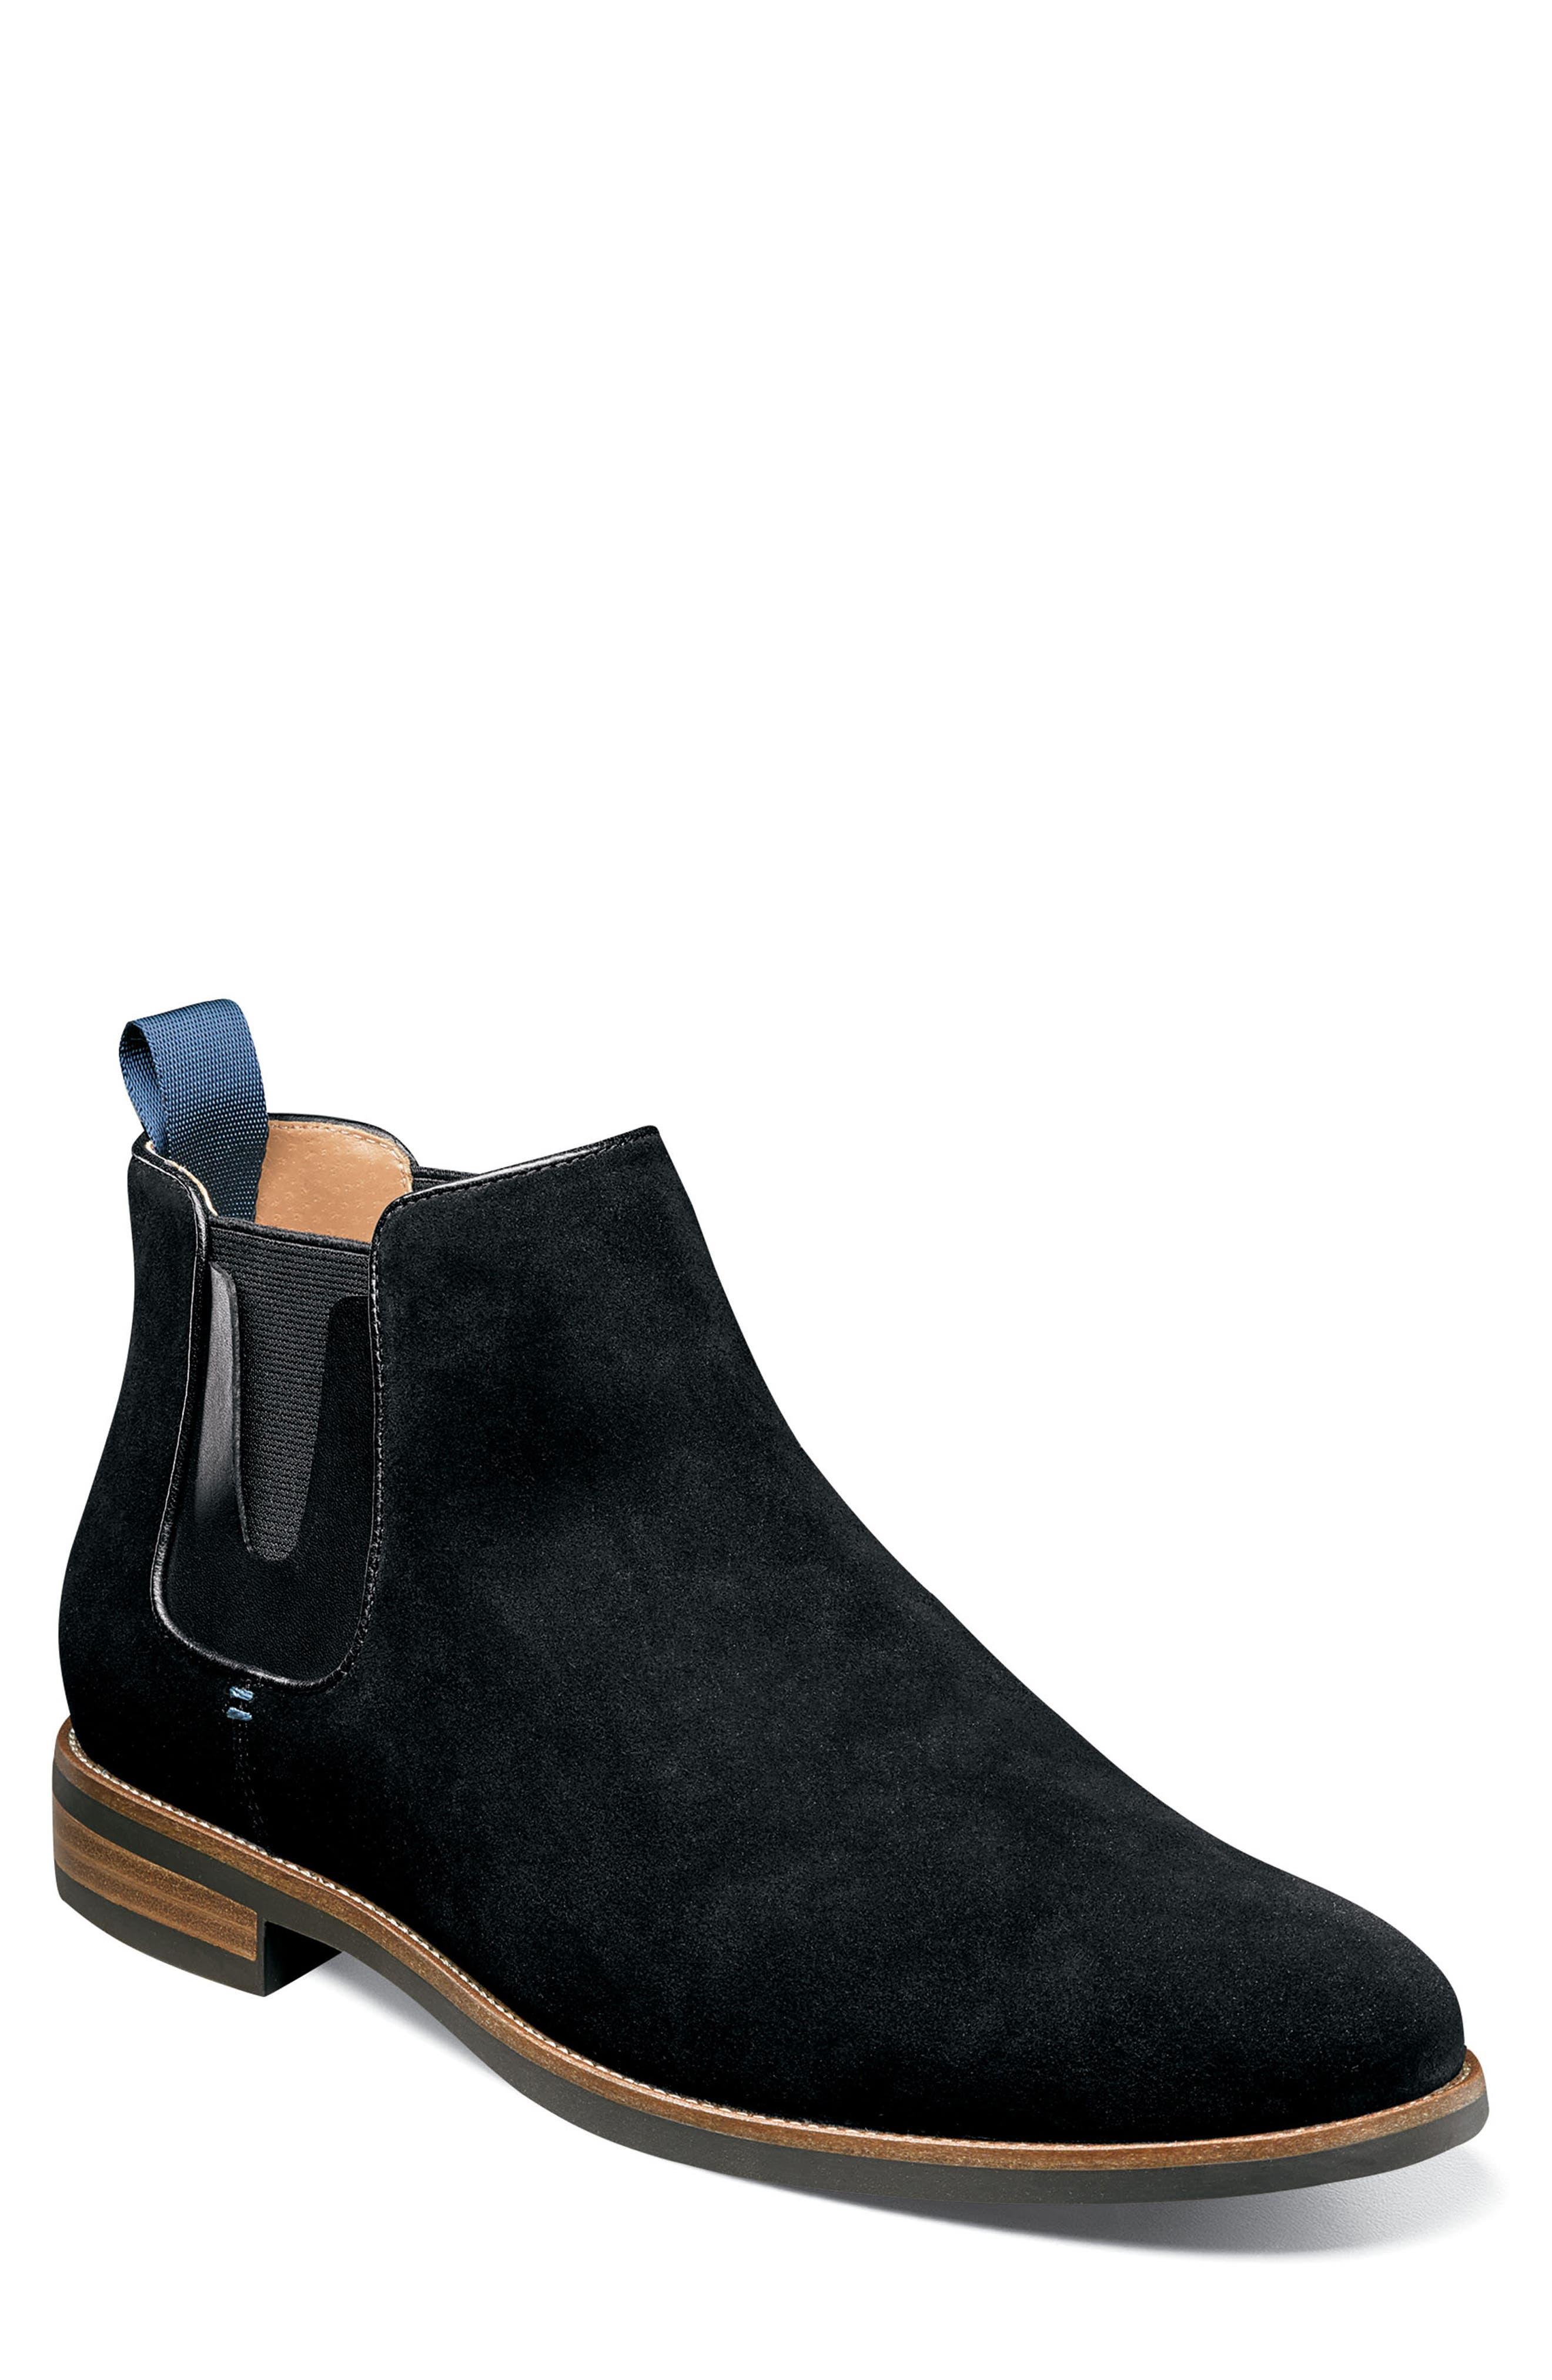 Uptown Plain Toe Mid Chelsea Boot,                             Main thumbnail 1, color,                             BLACK SUEDE